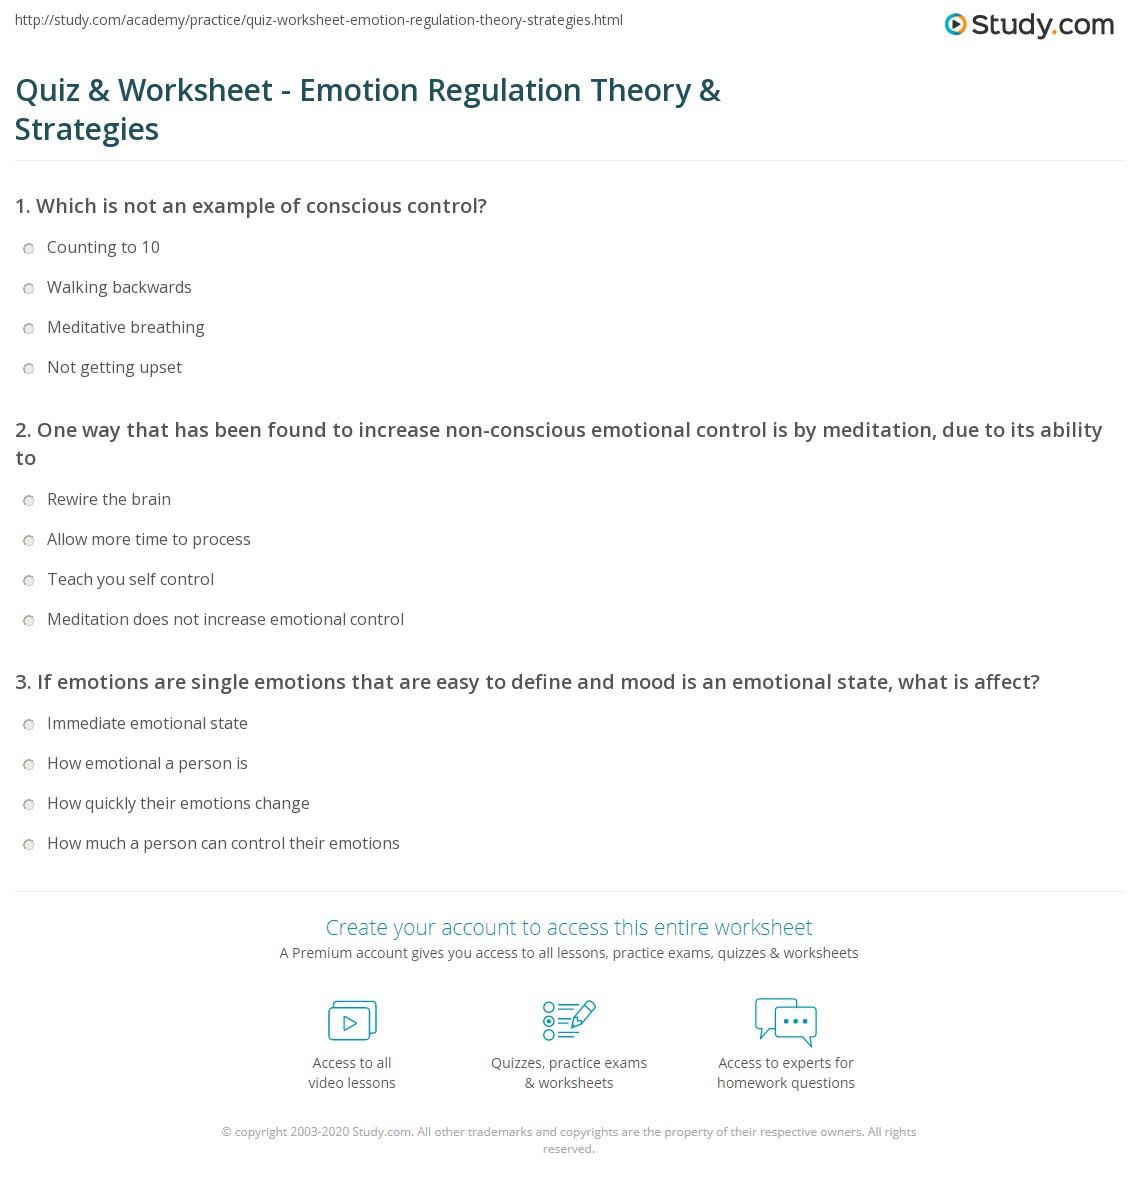 Quiz  Worksheet  Emotion Regulation Theory  Strategies  Study.com